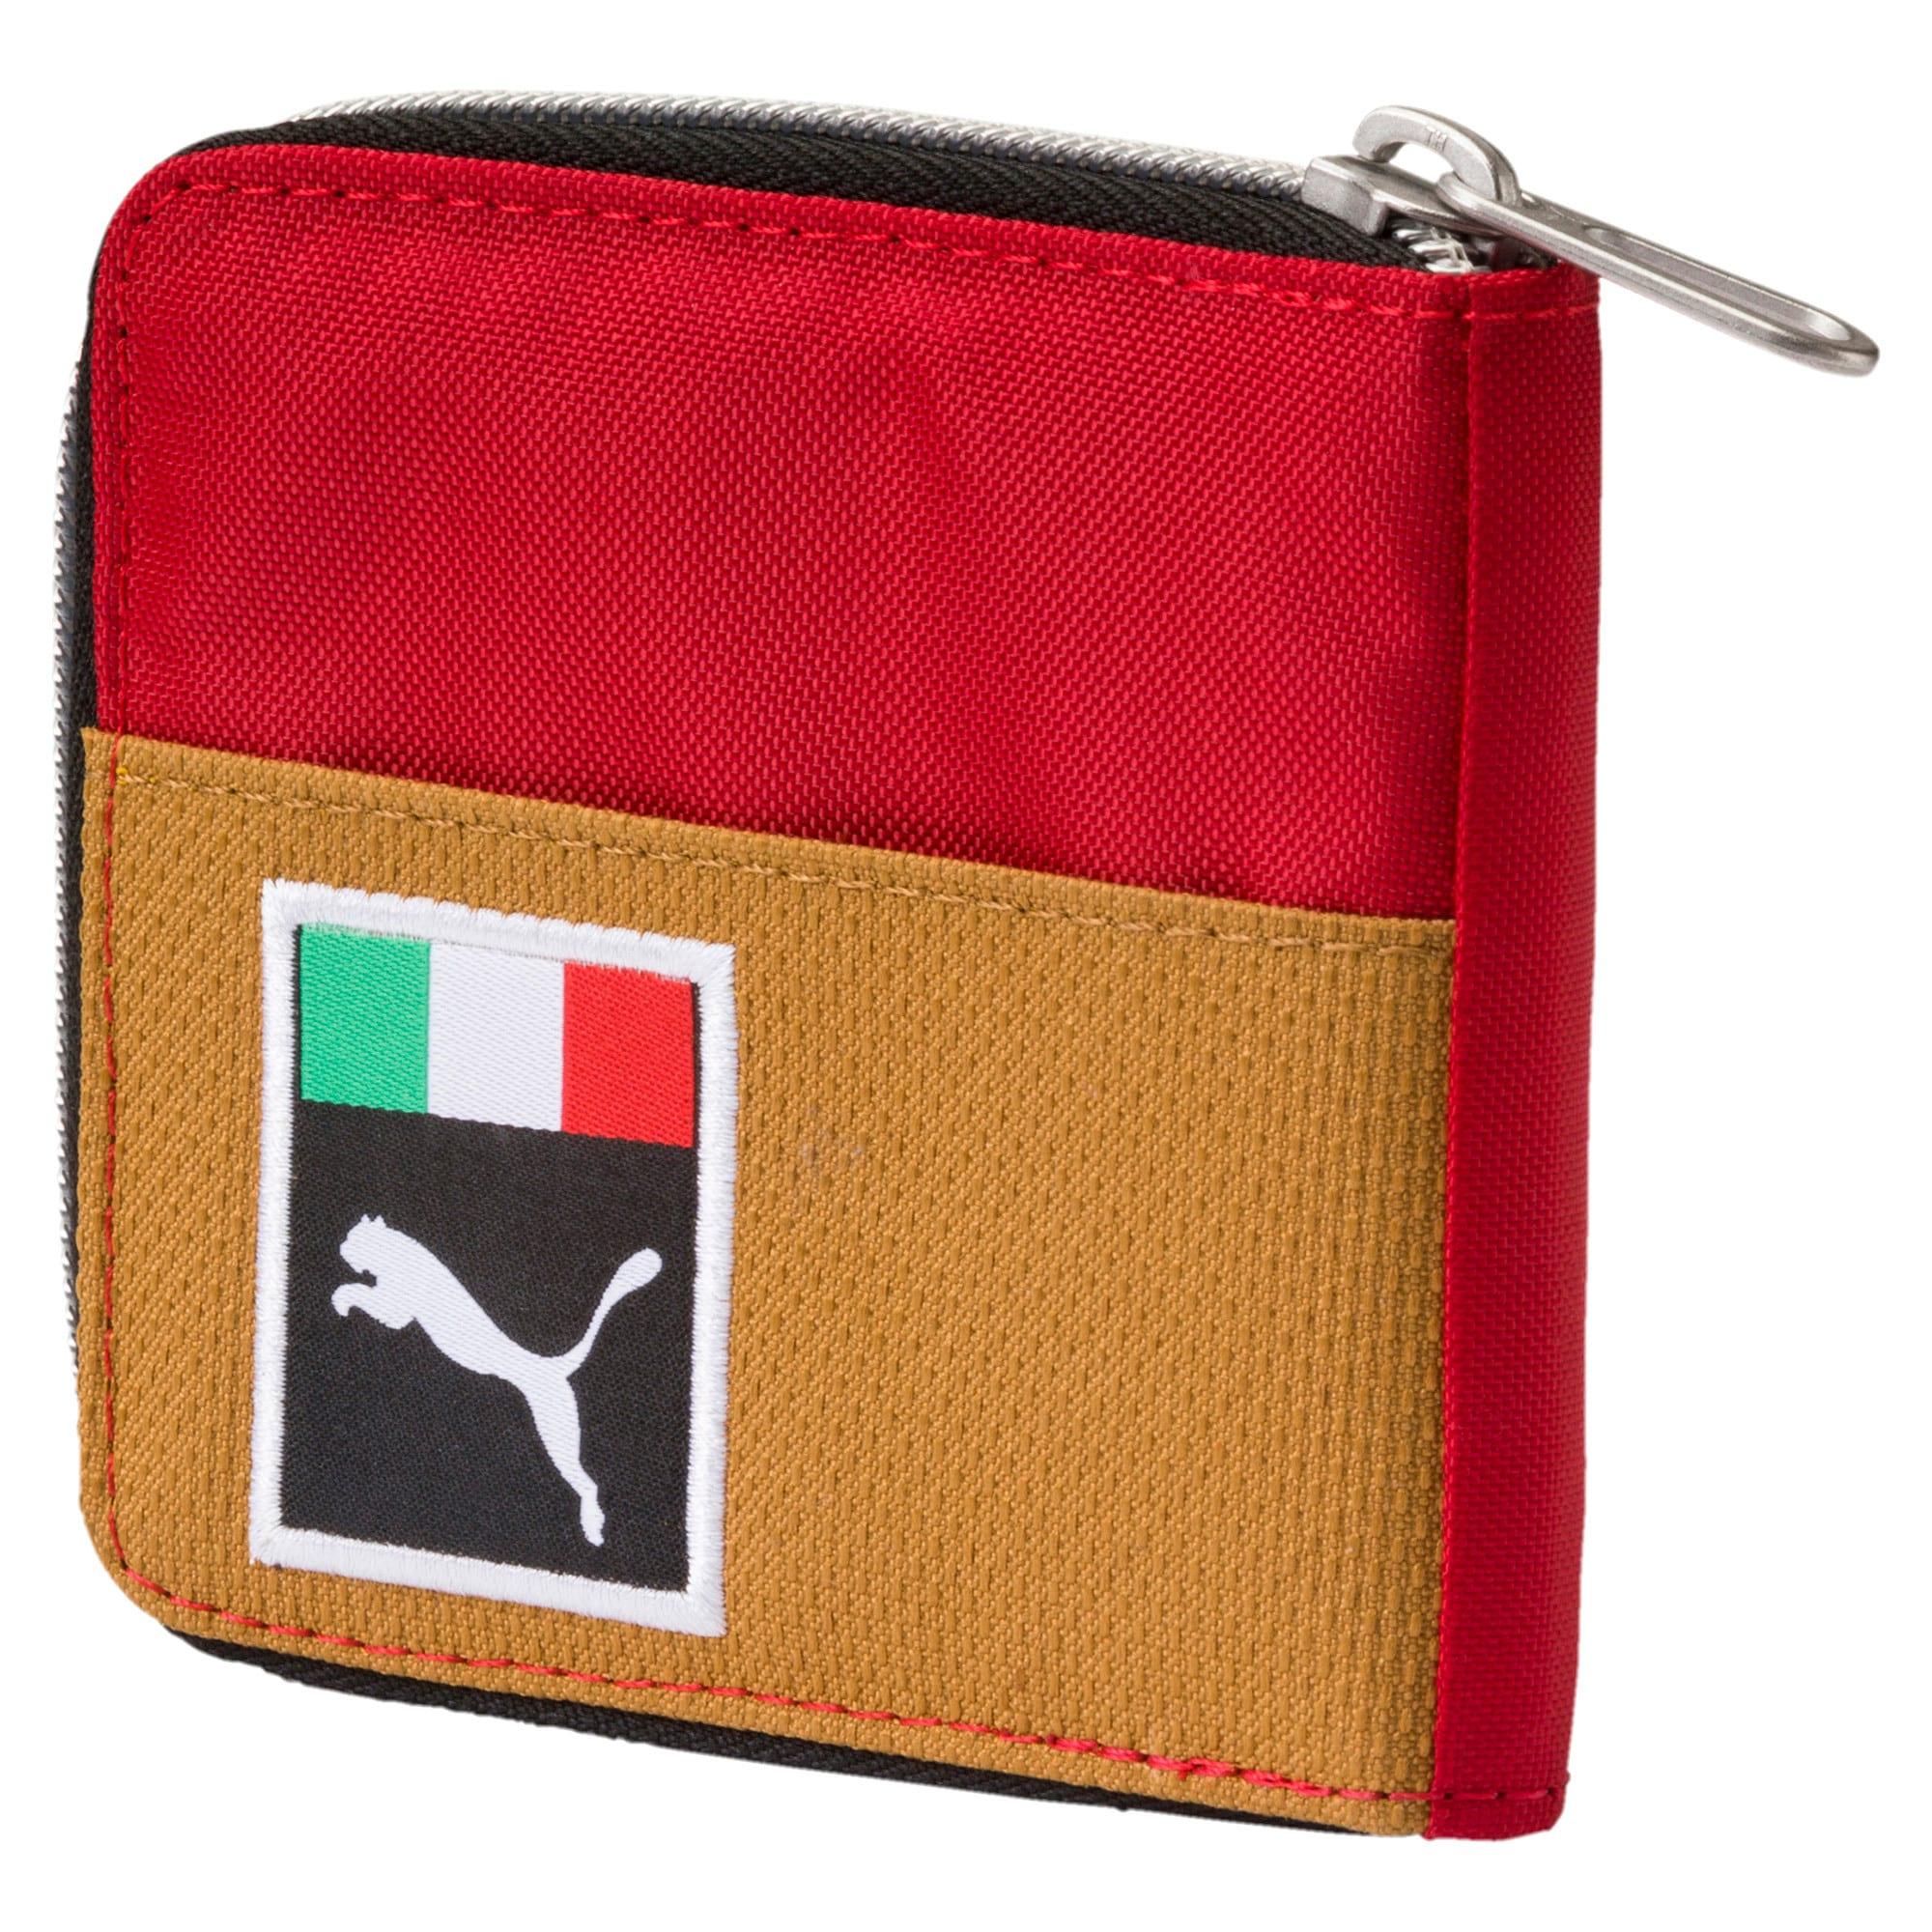 Thumbnail 2 of Scuderia Ferrari Fanwear Wallet, Rosso Corsa, medium